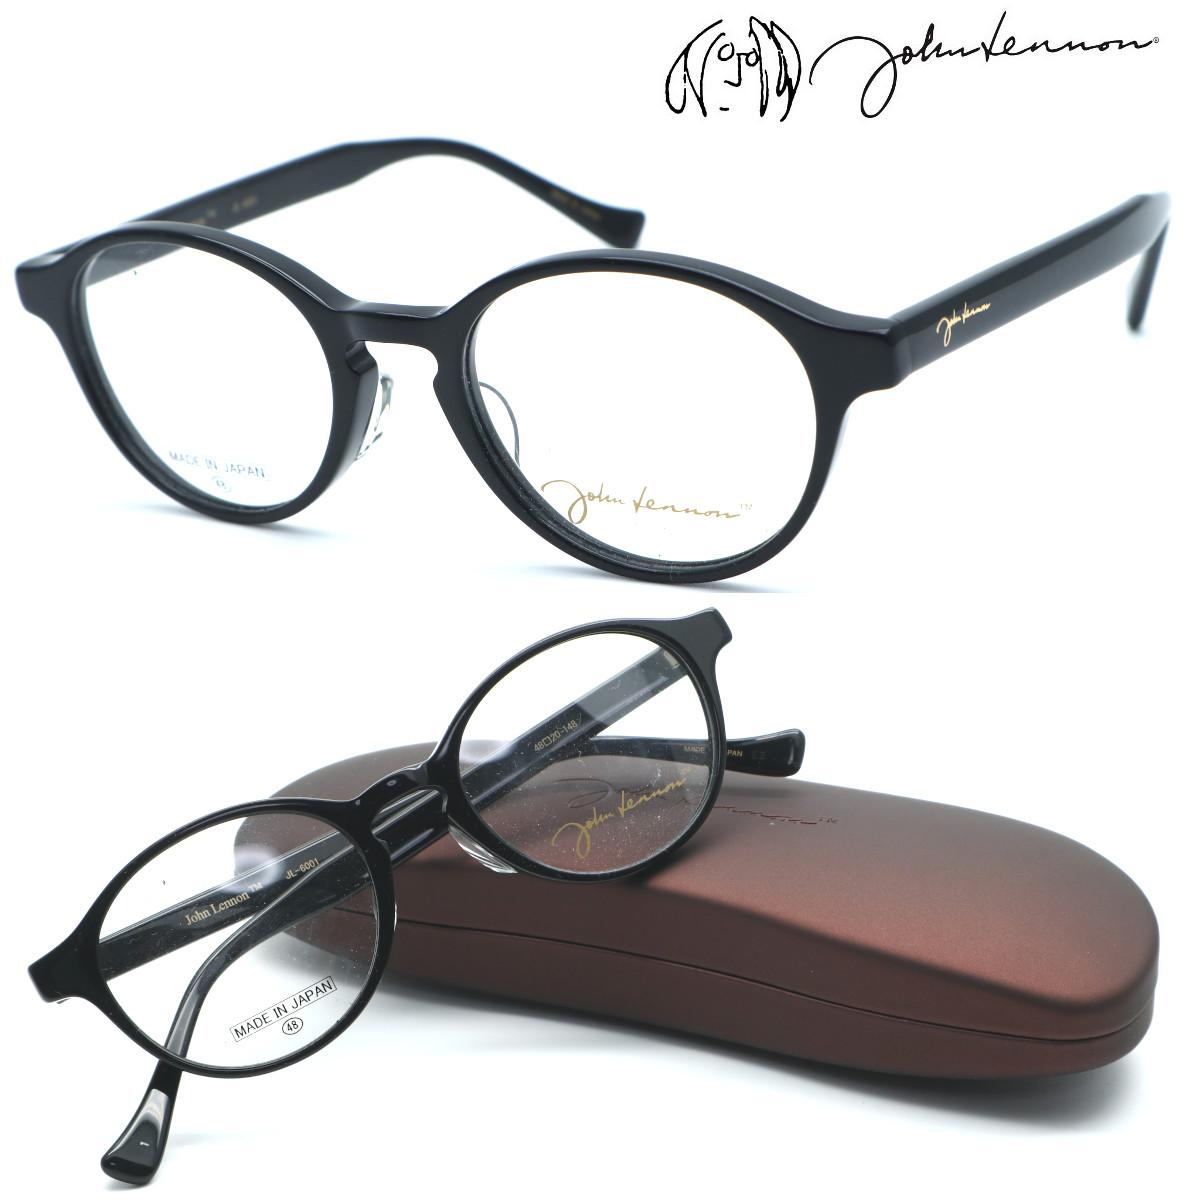 【john lennon】ジョンレノン JL-6001 col.1 メガネ 標準レンズセット  【正規品】【店内全品送料無料】